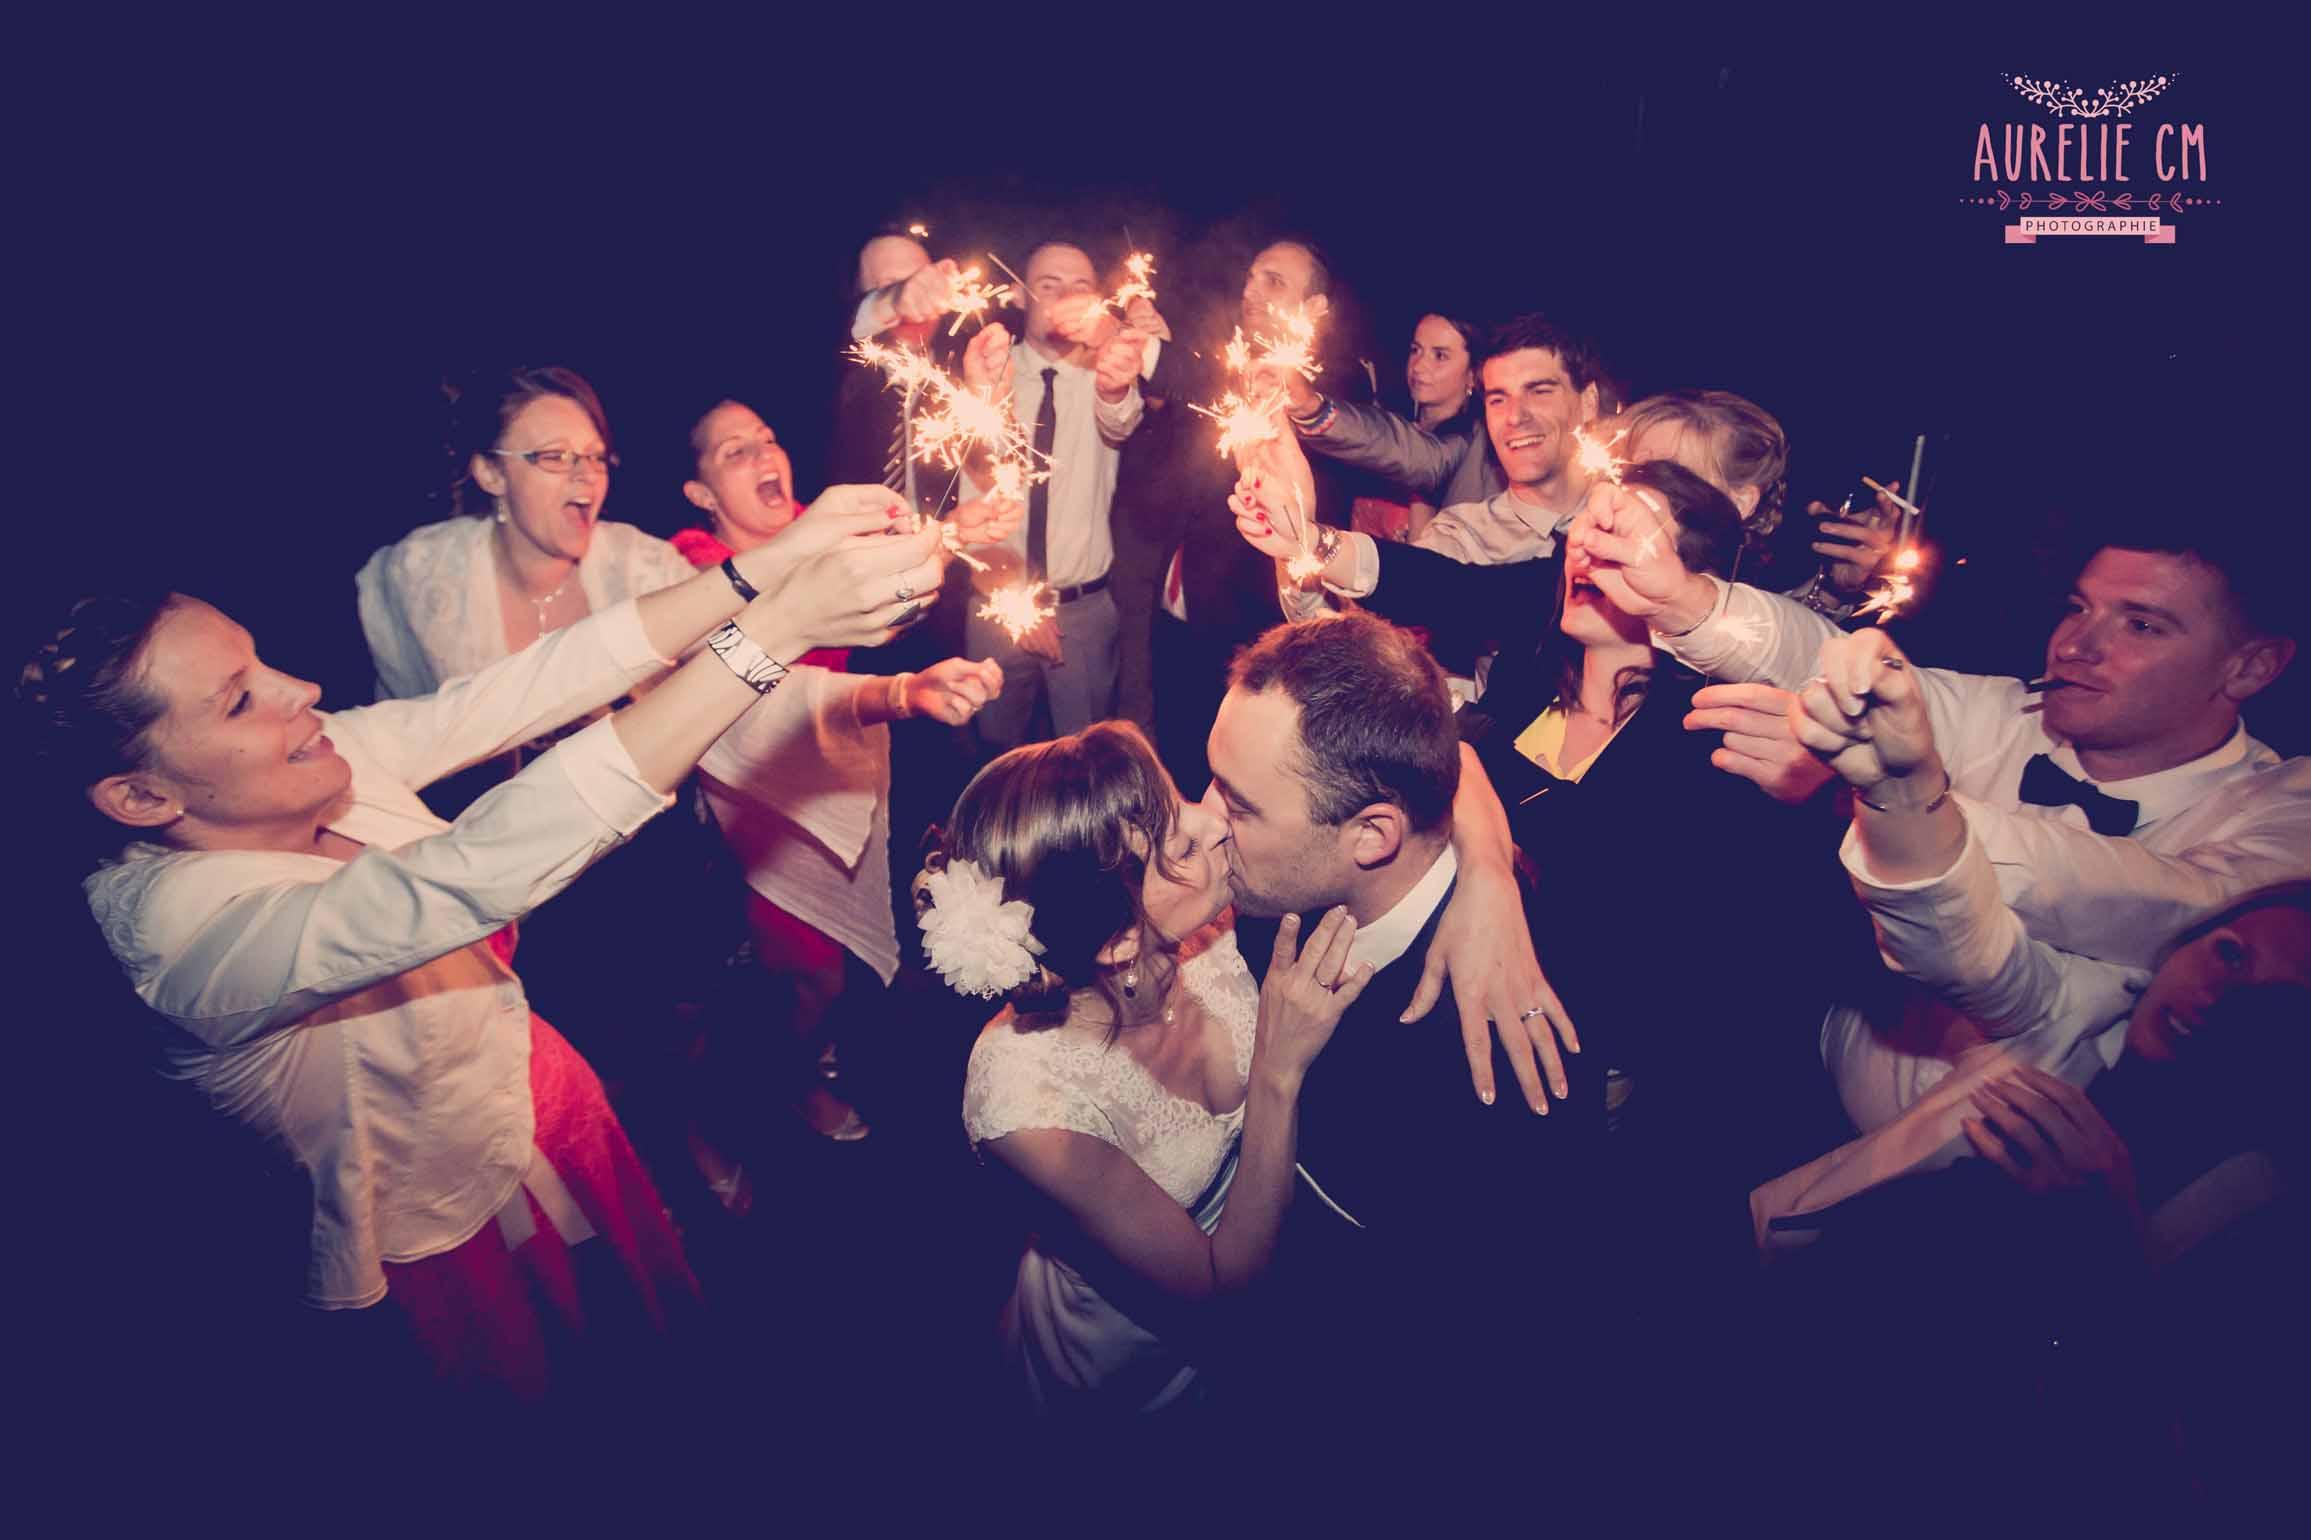 photographe mariage le havre-90015